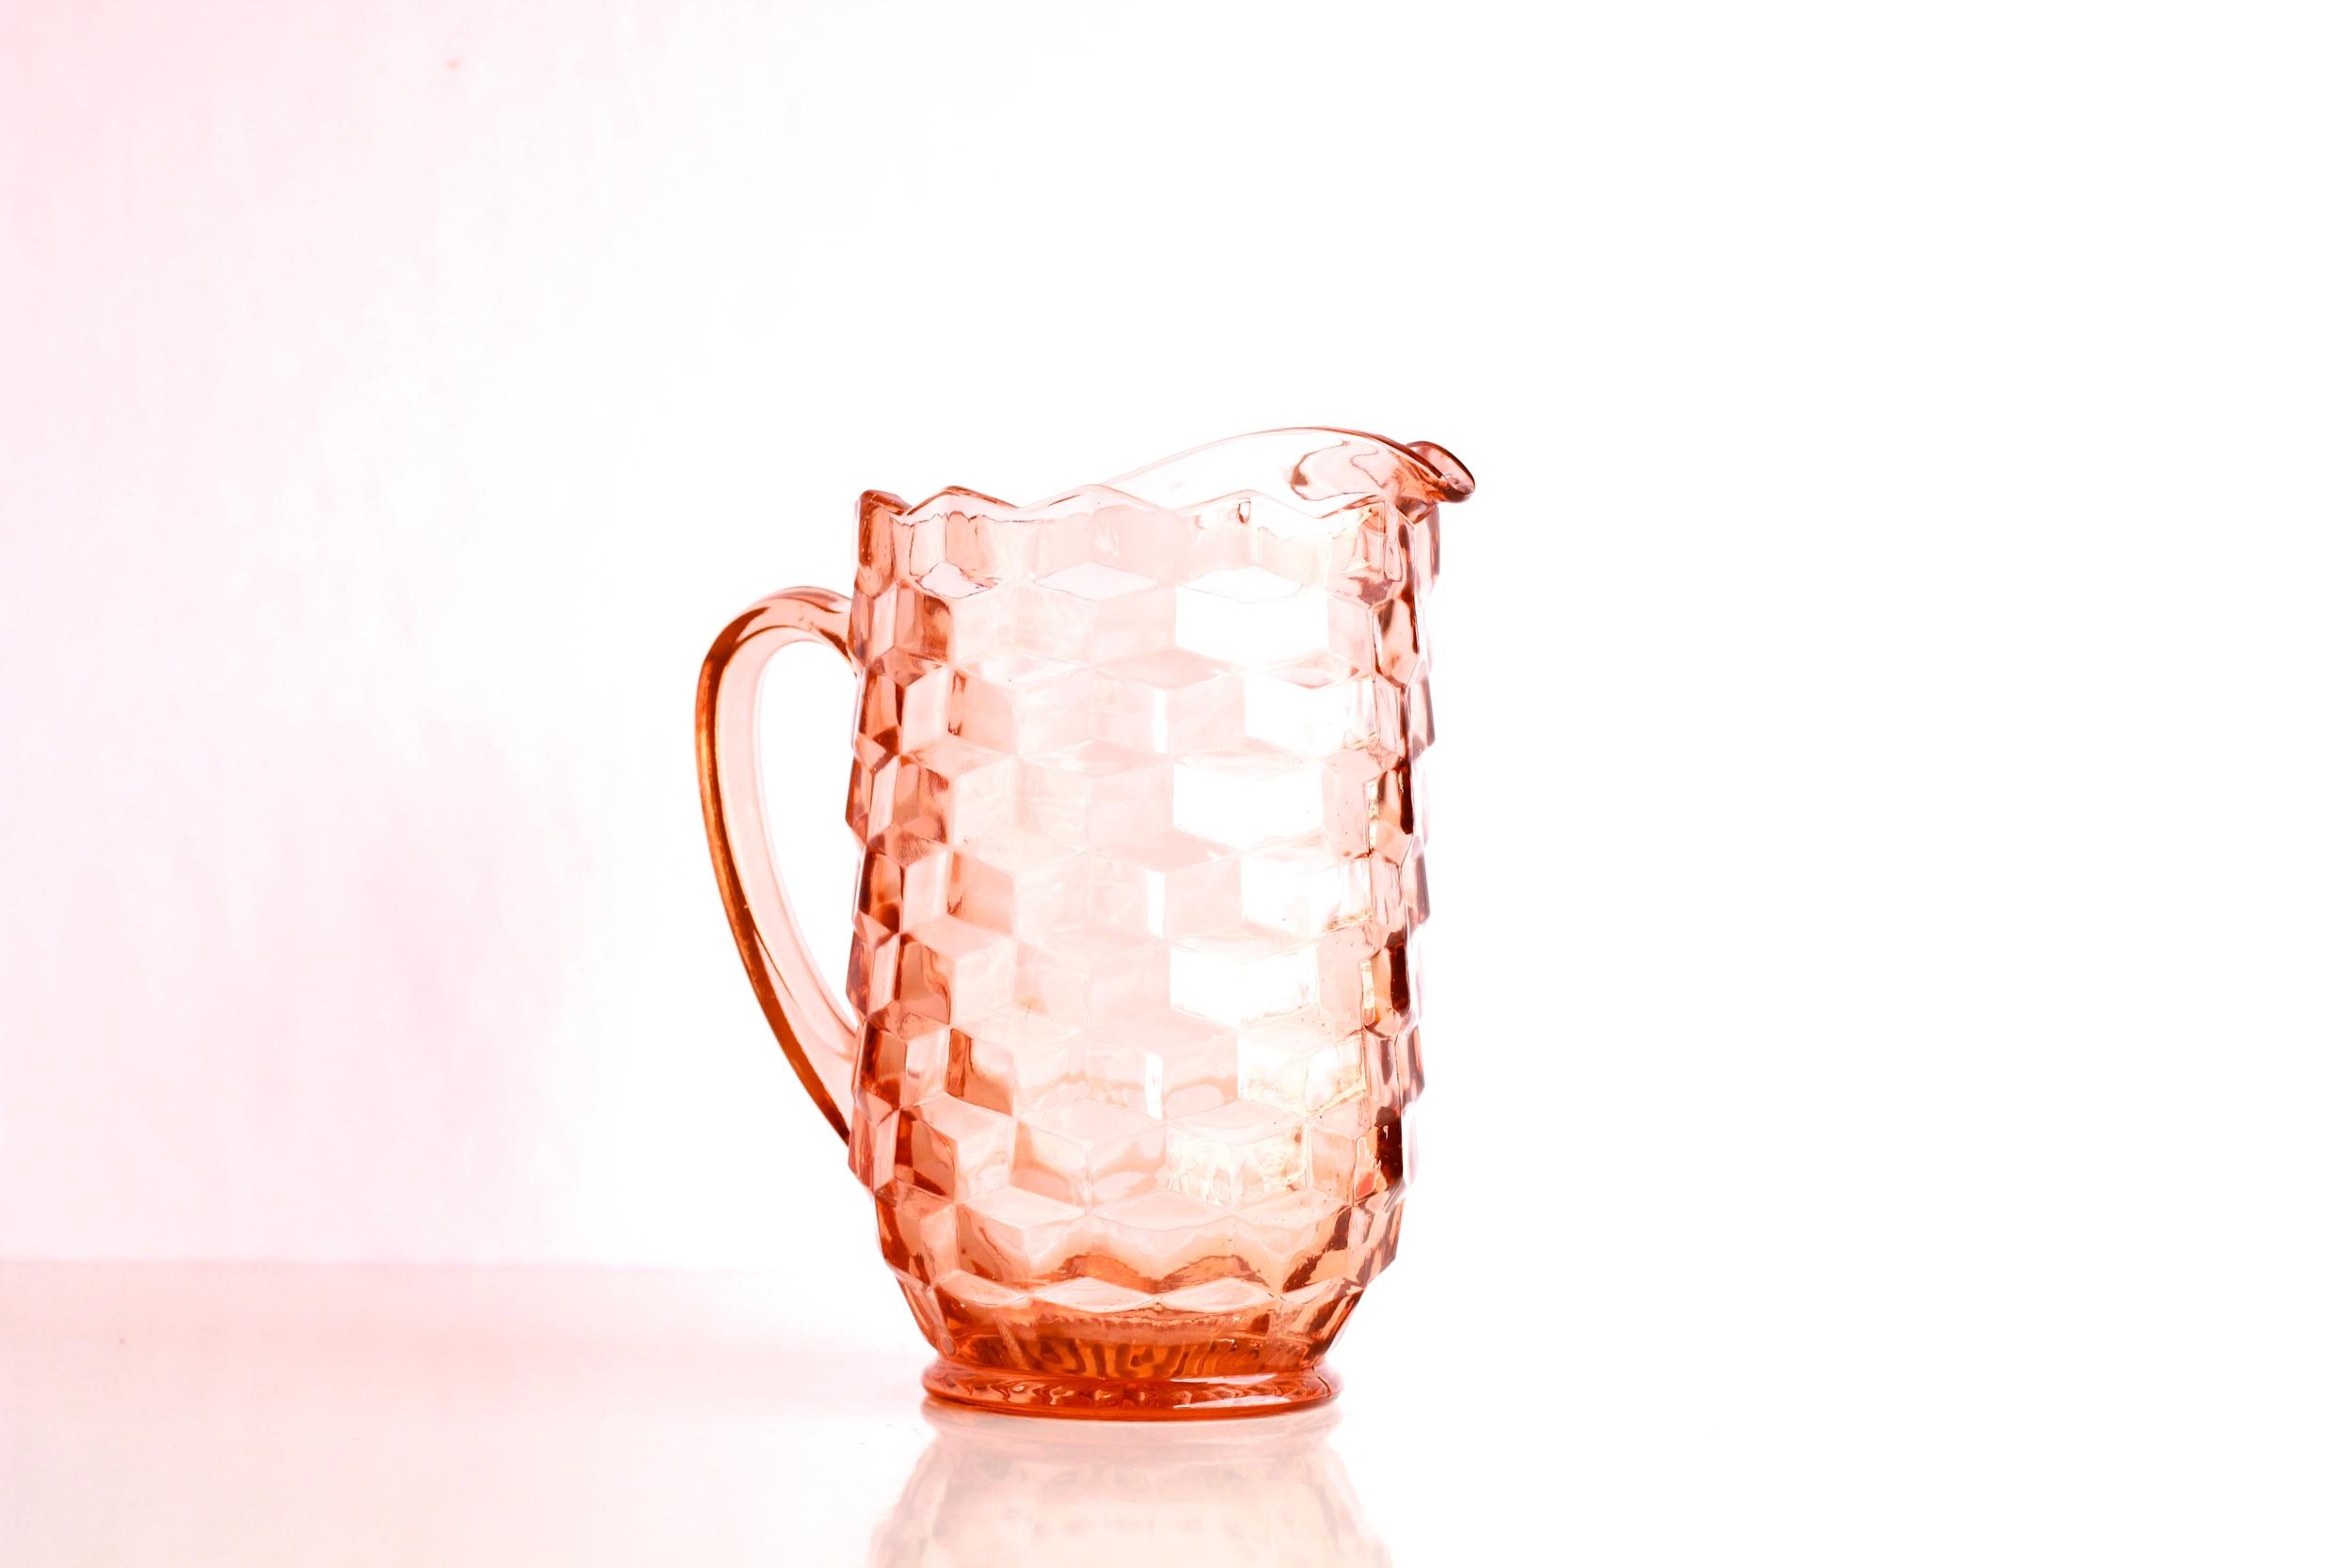 Pink Depression Glass Pitchers